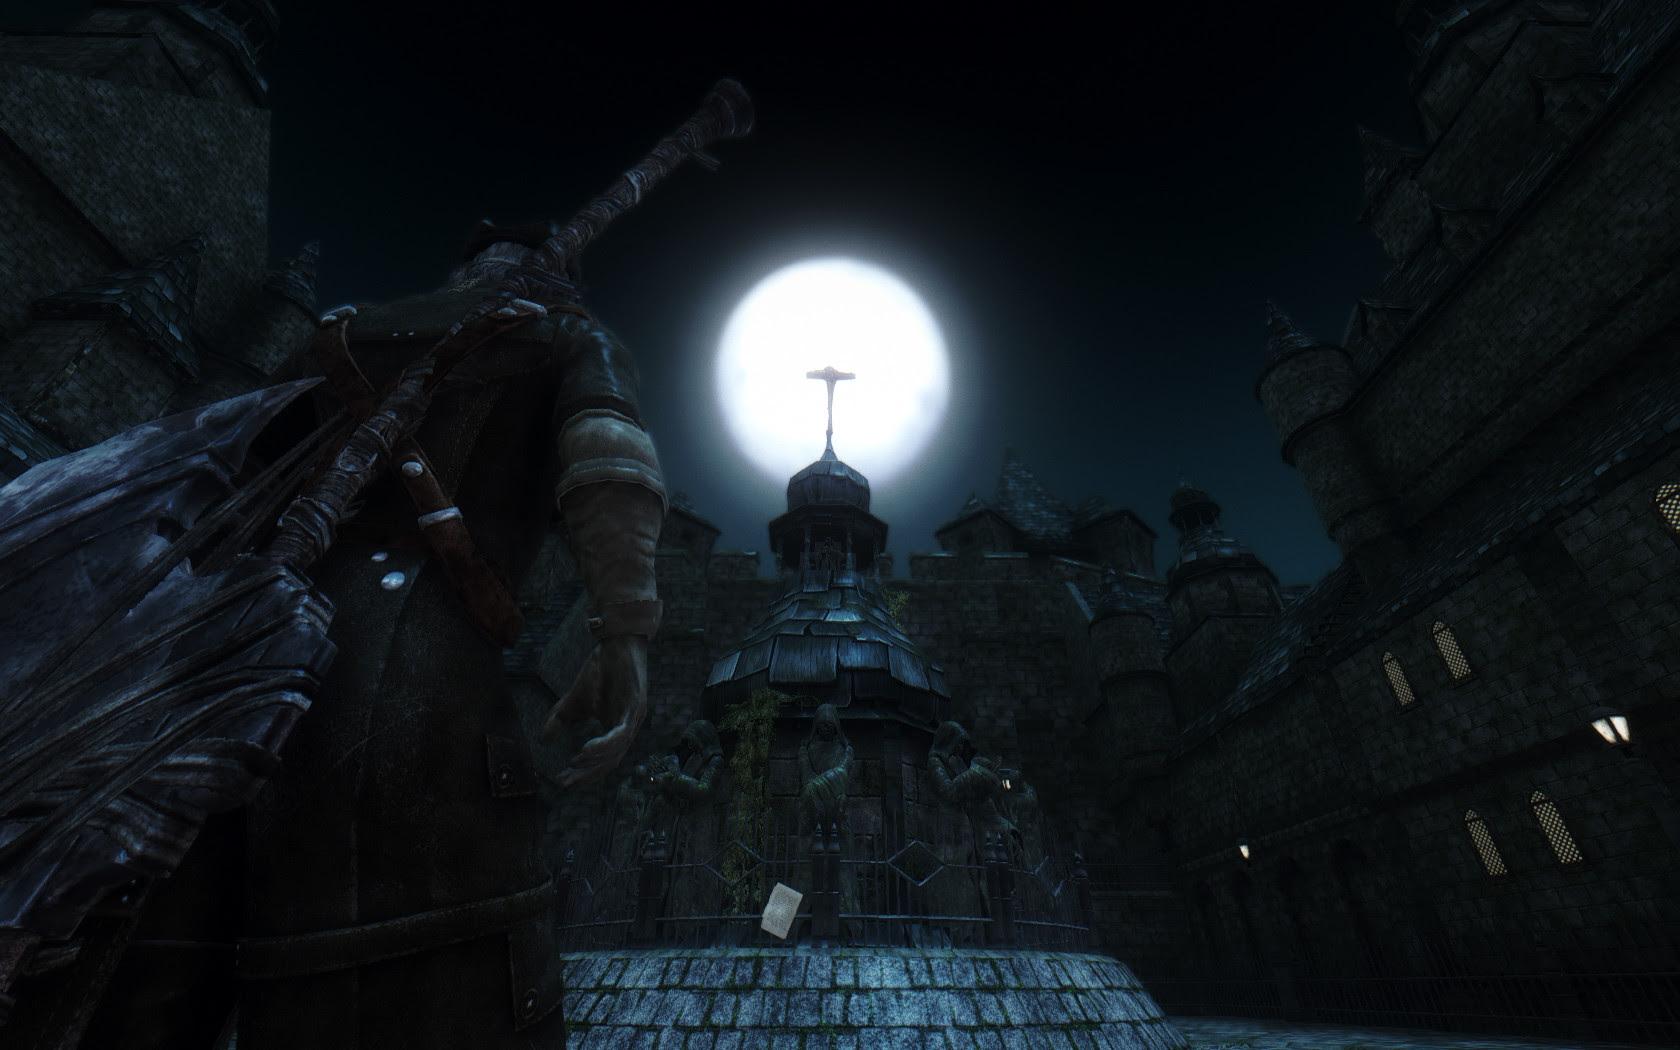 New mod brings Yharnam to Skyrim screenshot